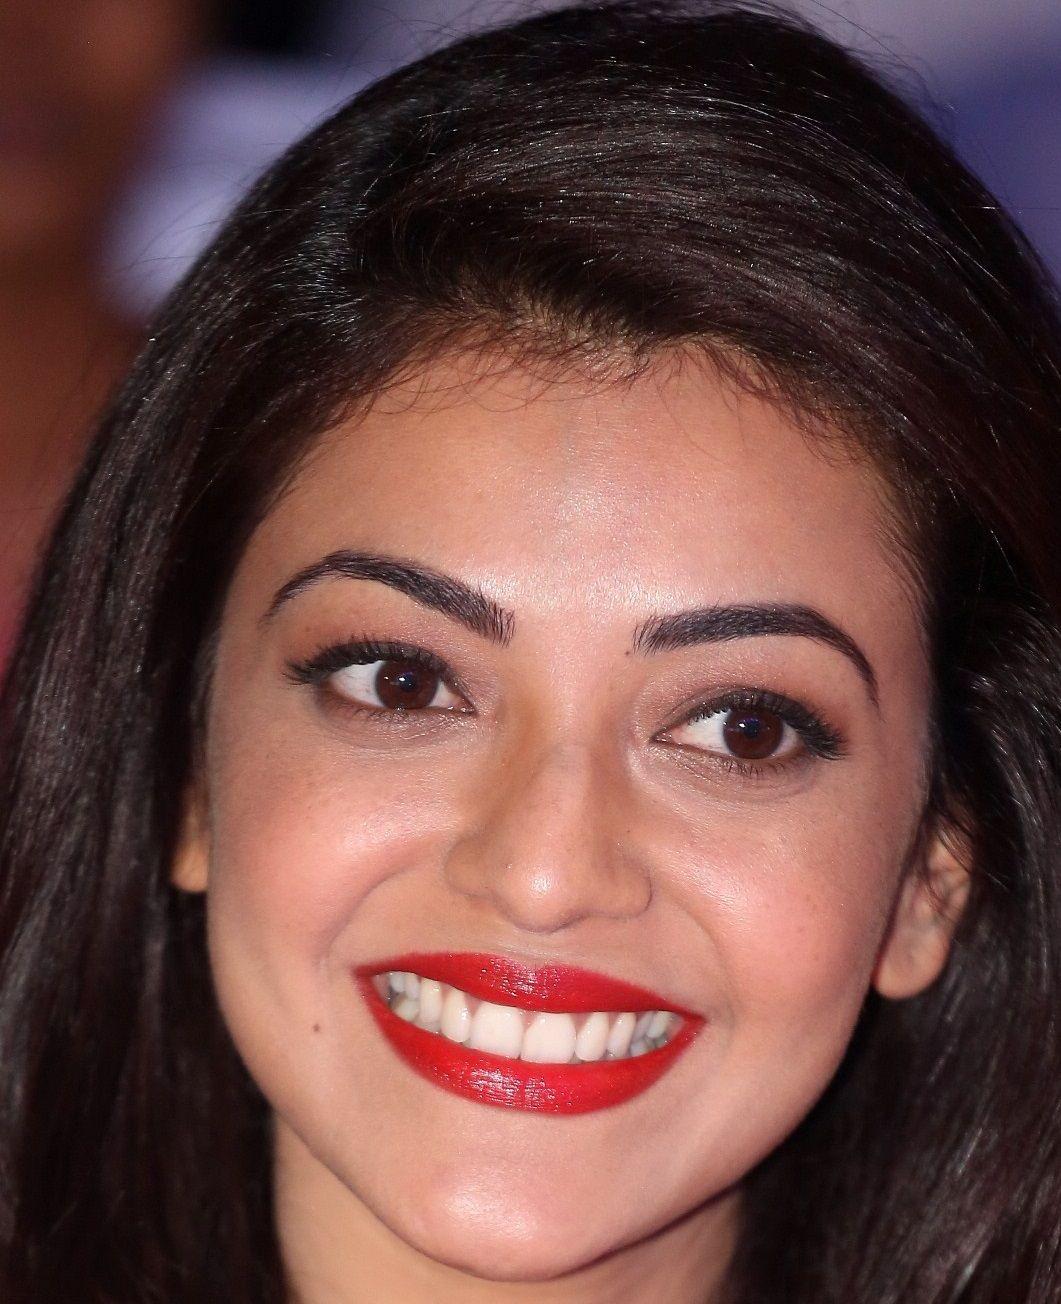 Indian Actress Kajal Aggarwal Smiling Face Close Up Stills Indian Actress Hot Pics Bollywood Actress Hot Photos Beautiful Bollywood Actress